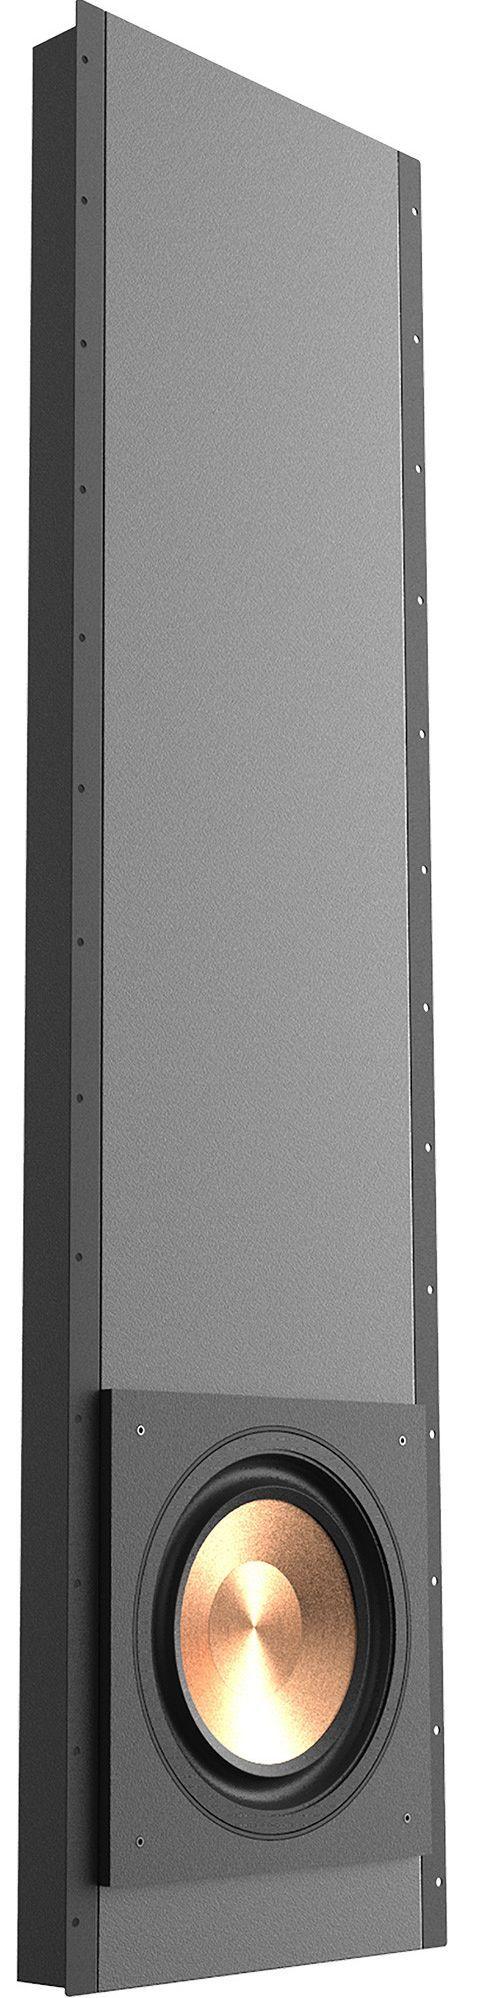 "Klipsch® Professional Series PRO-1200SW Black Polymer Veneer 12"" In-Wall Subwoofer-1064595"